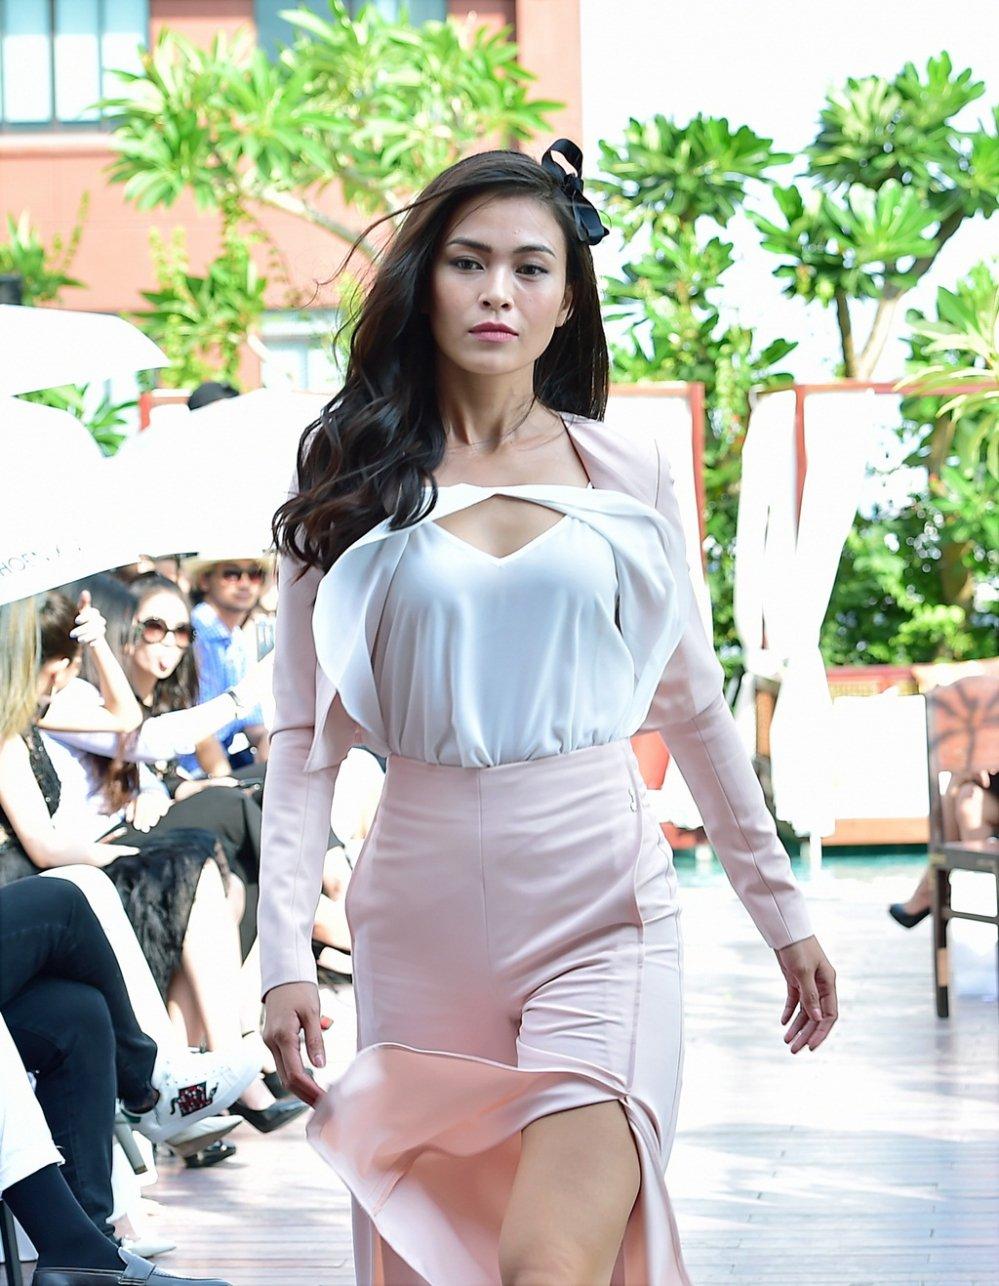 Ba Quan quan Top Model Mau Thuy - Huong Ly - Ngoc Chau tranh nhau lam first face, vedette hinh anh 5